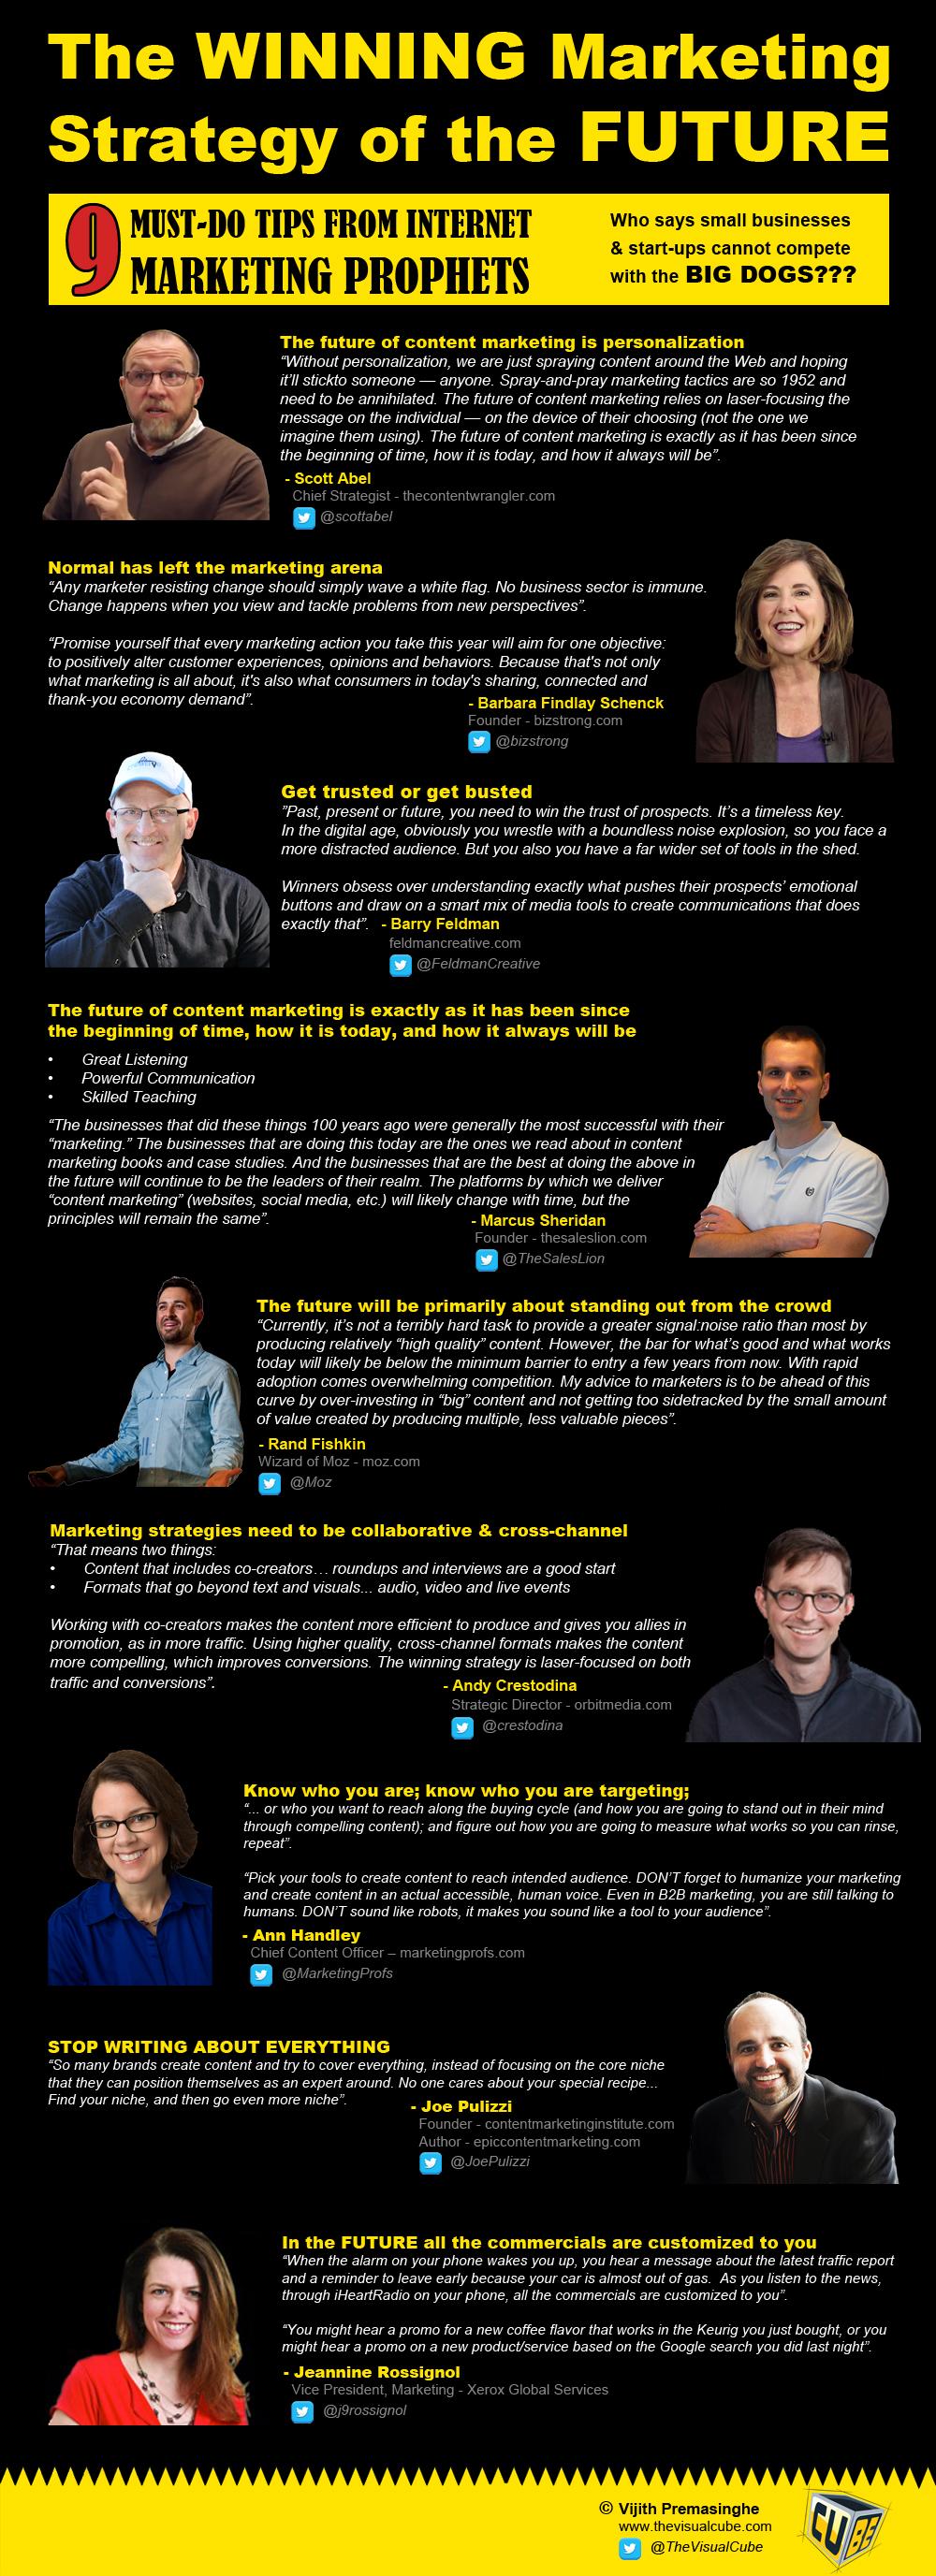 future-marketing-strategy-infographic-2015-Vijith-Premasinghe-The-Visual-Cube